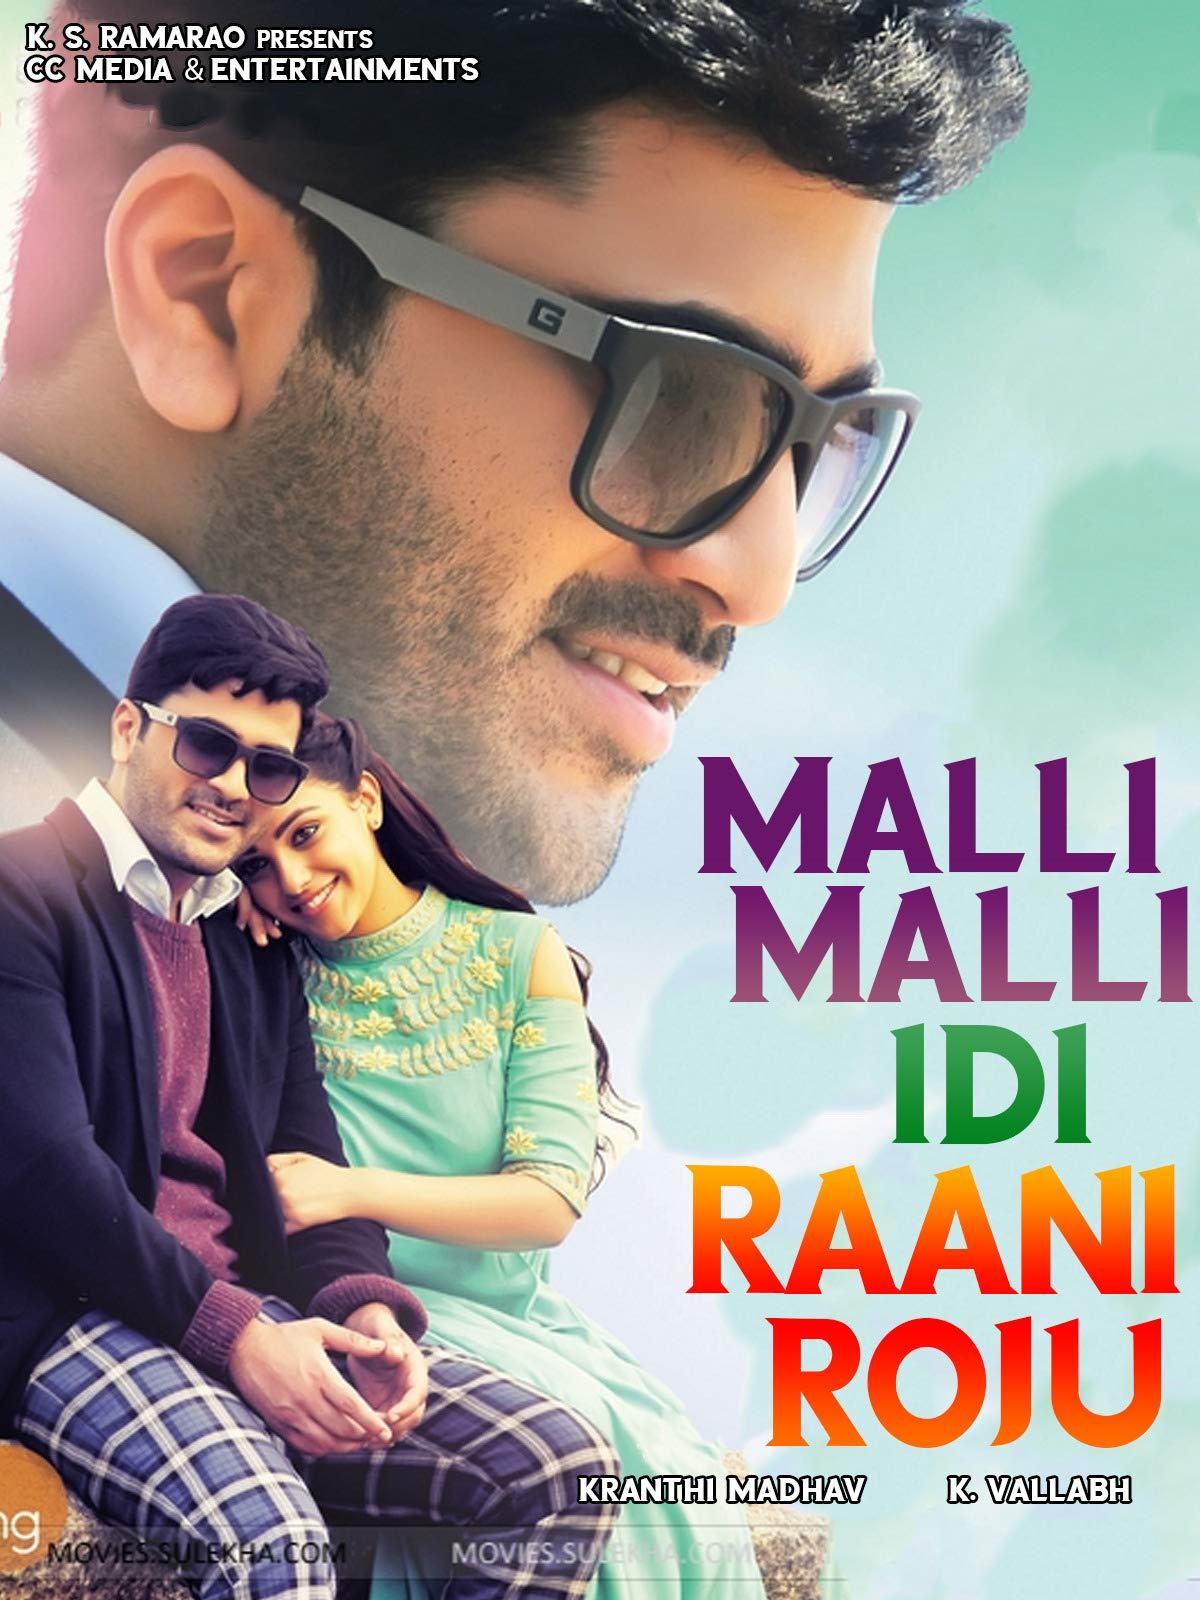 Real Diljala (Malli Malli Idi Rani Roju) 2015 Hindi Dual Audio UNCUT 480p HDRip 450MB Download